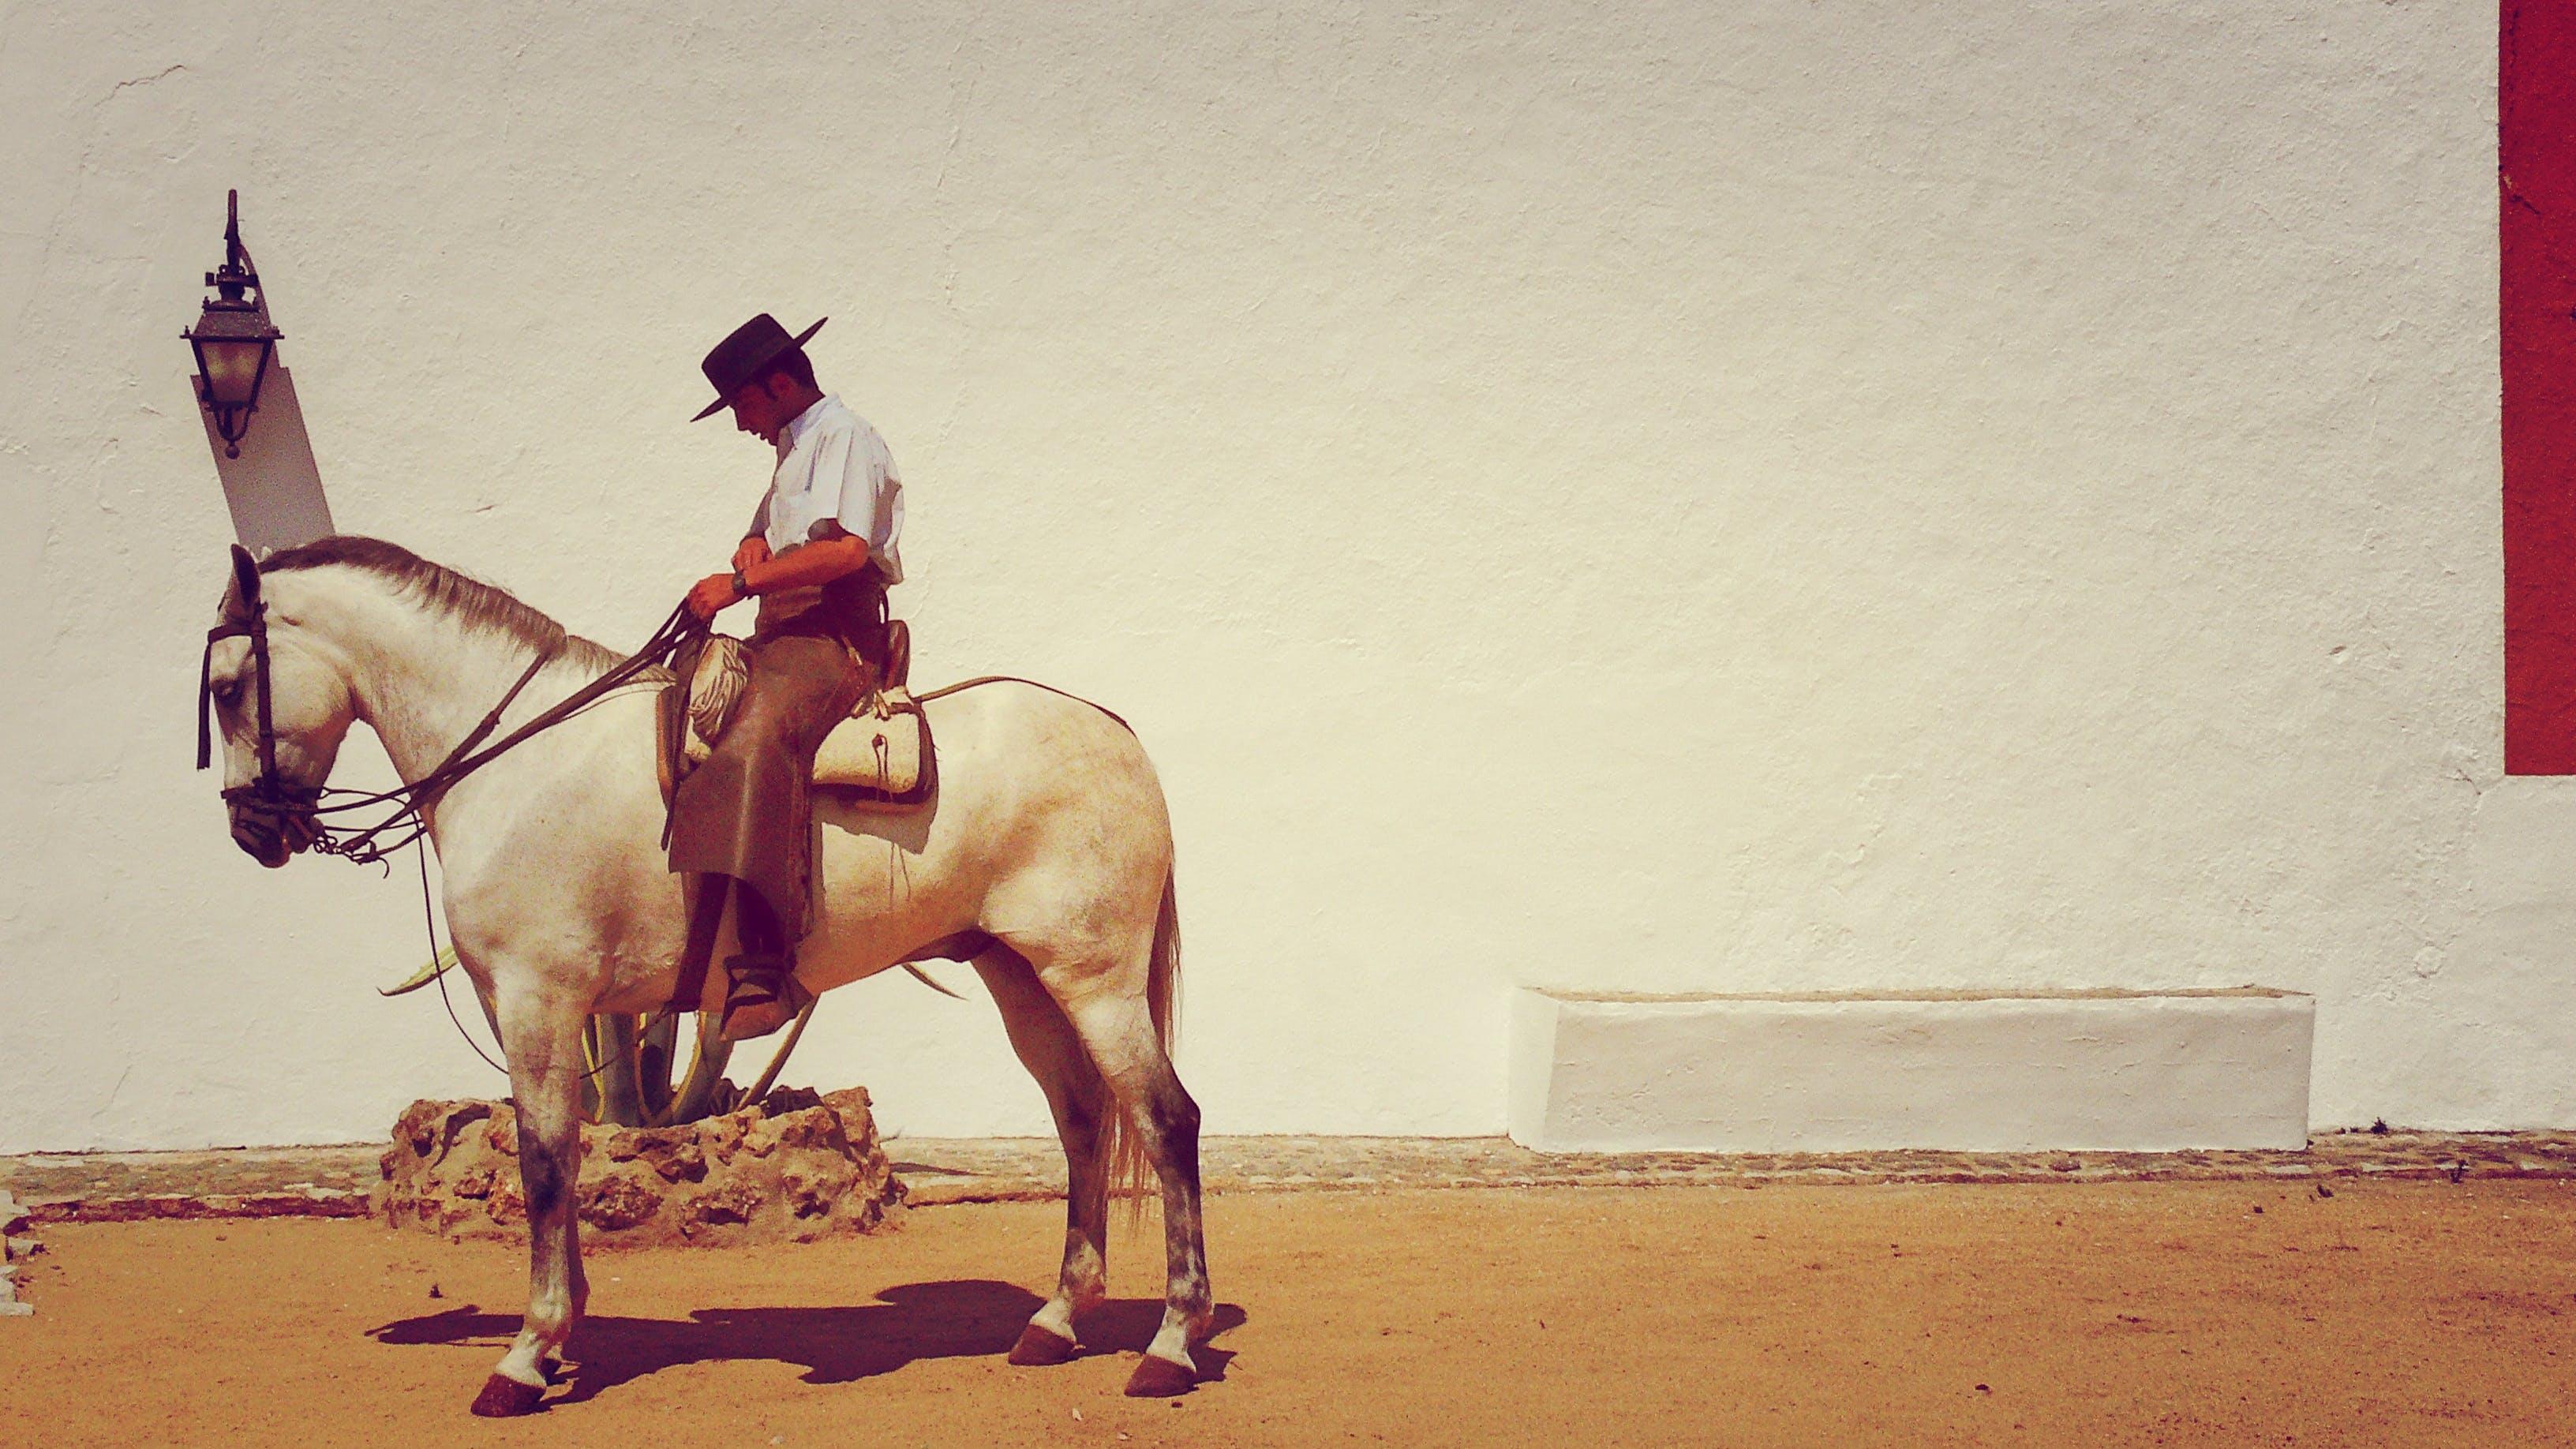 Horseman Near White Wall Fence Photograph